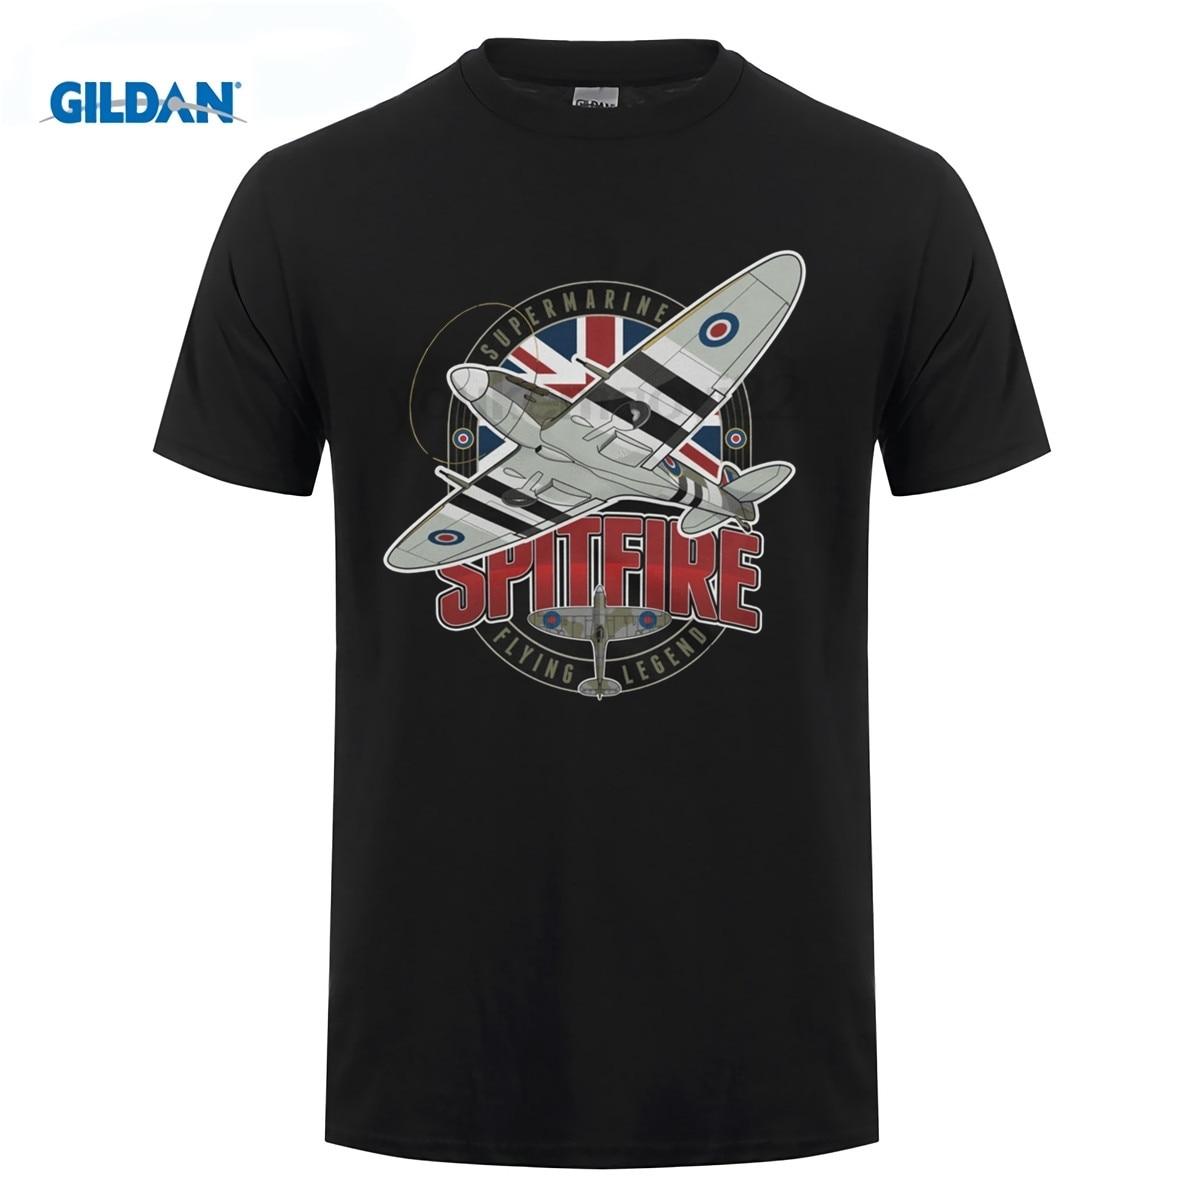 GILDAN Supermarine Spitfire T Shirt